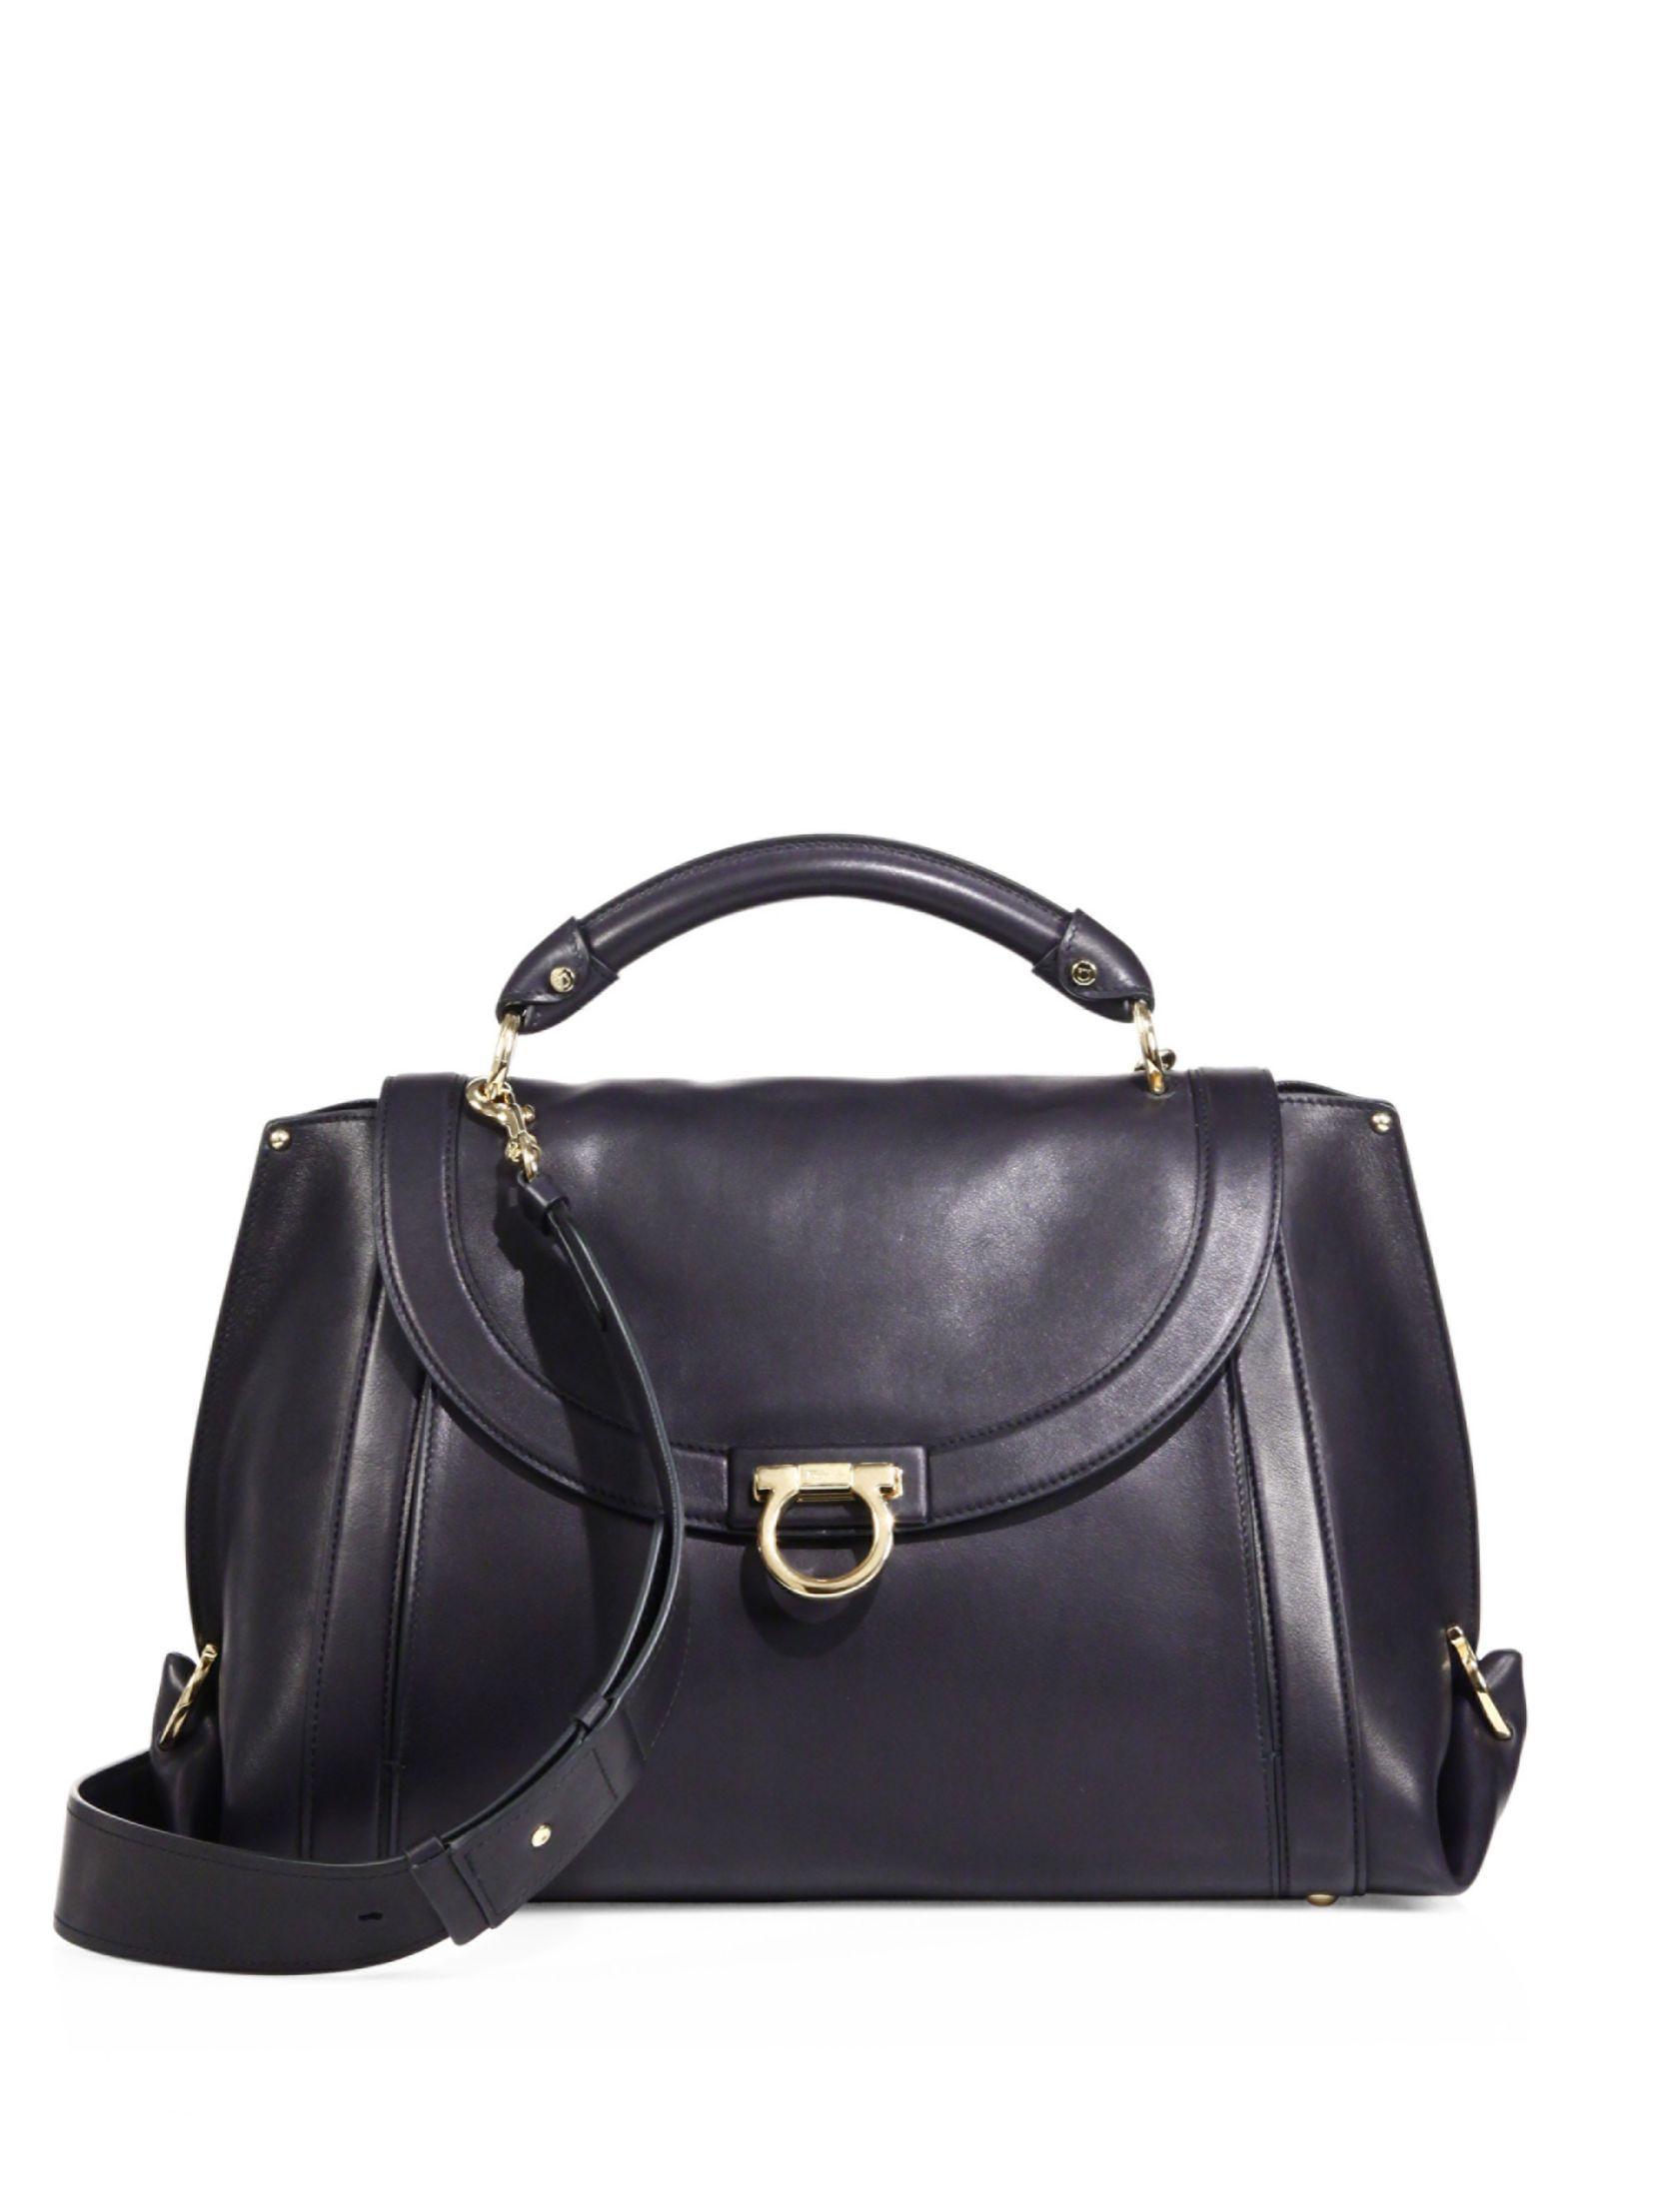 e8a1d434722a Salvatore Ferragamo Soft Sofia Large Leather Top Handle Bag   Things ...